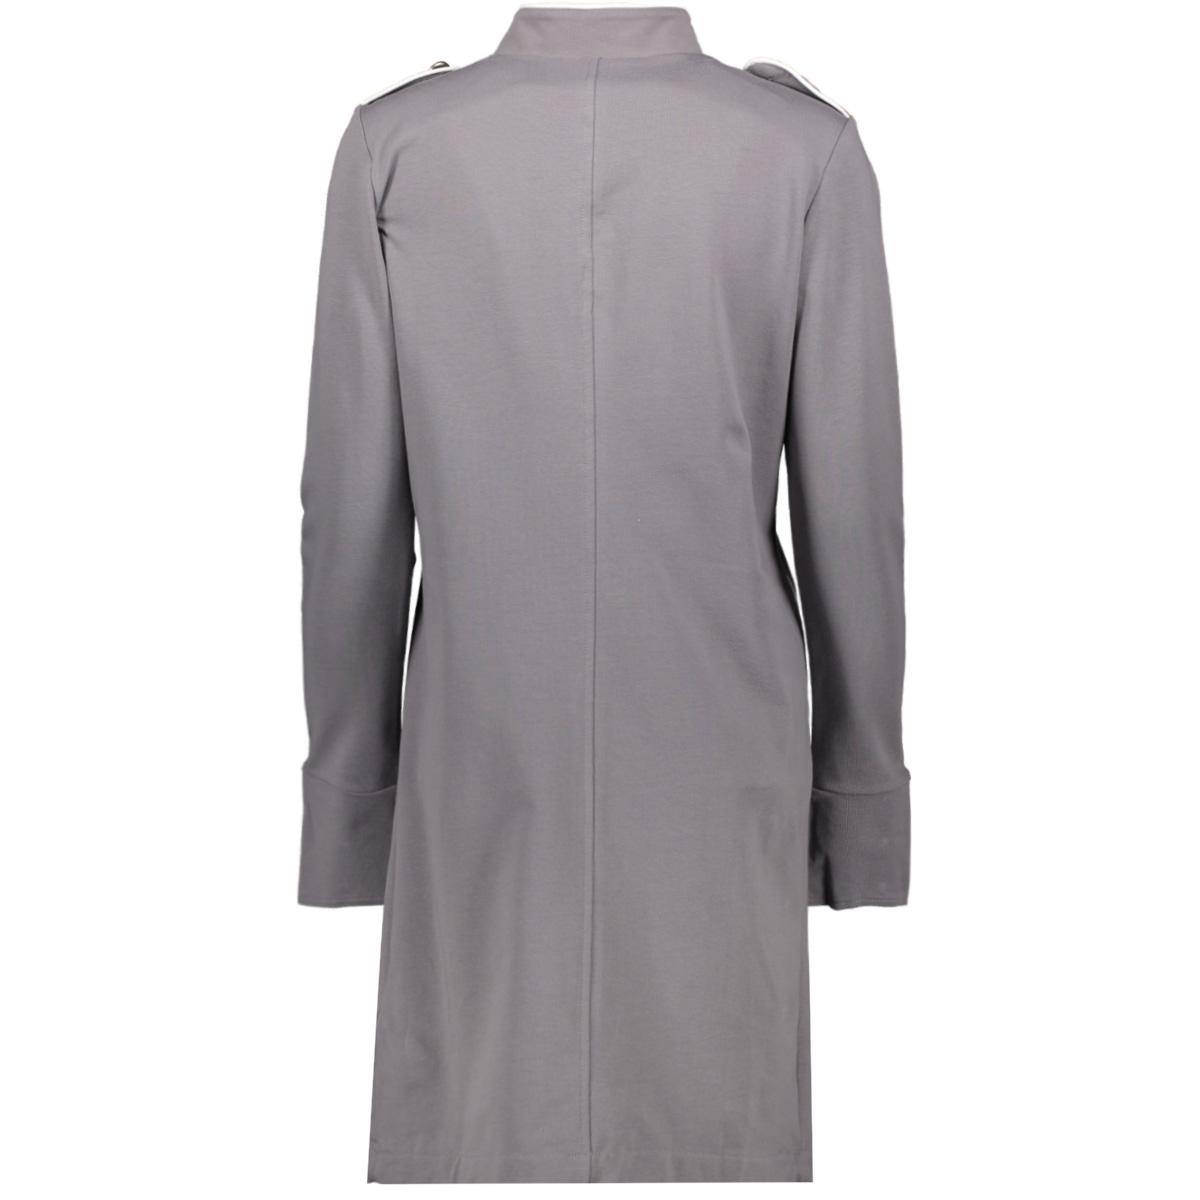 steffie long milatary blazer 192 zoso blazer grey/white